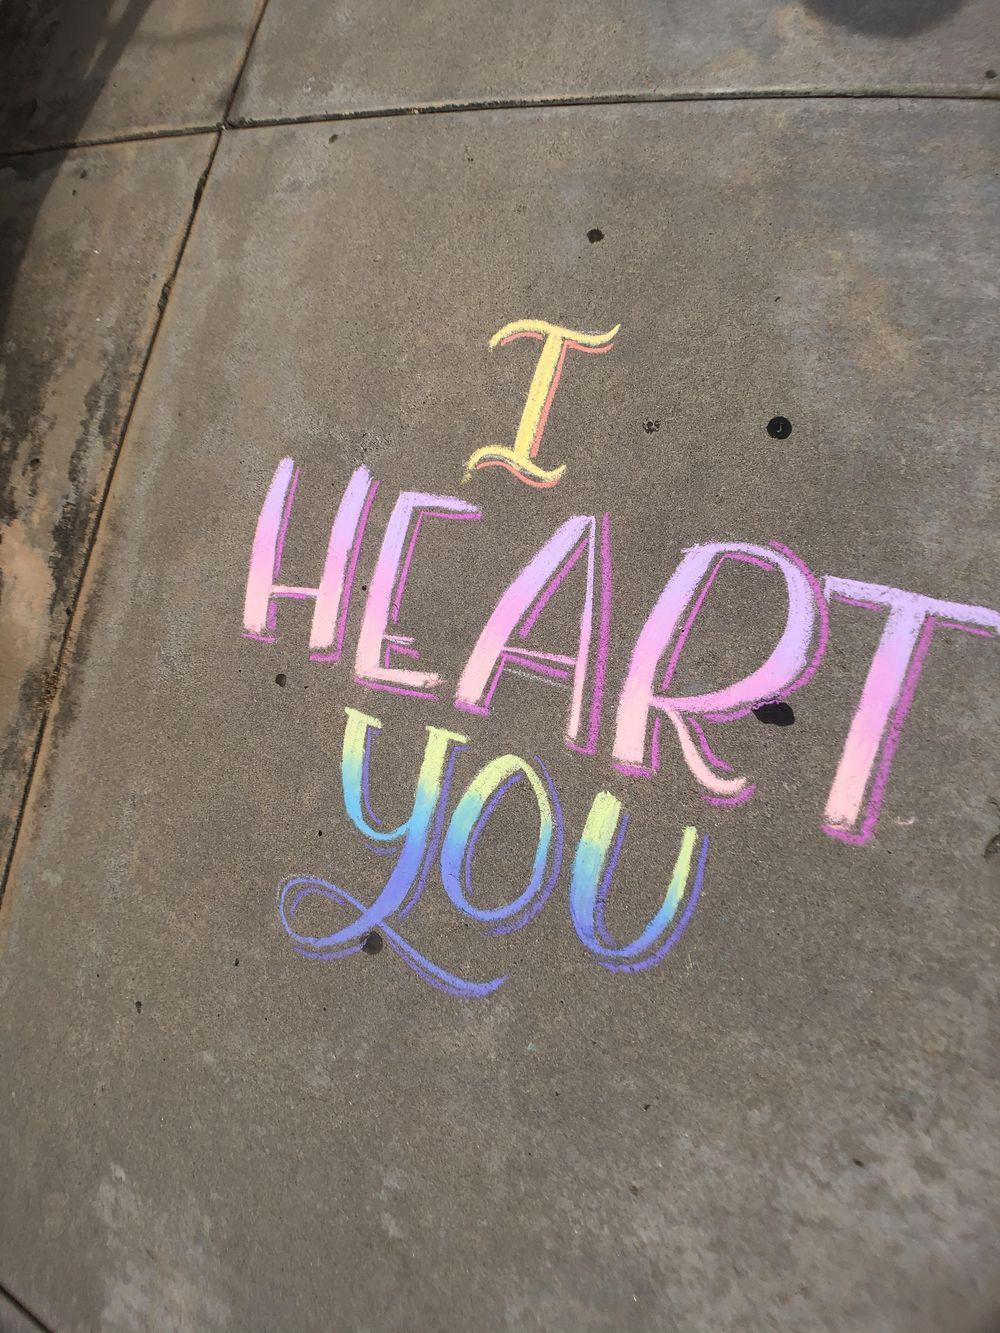 Sidewalk chalk - image 1 - student project